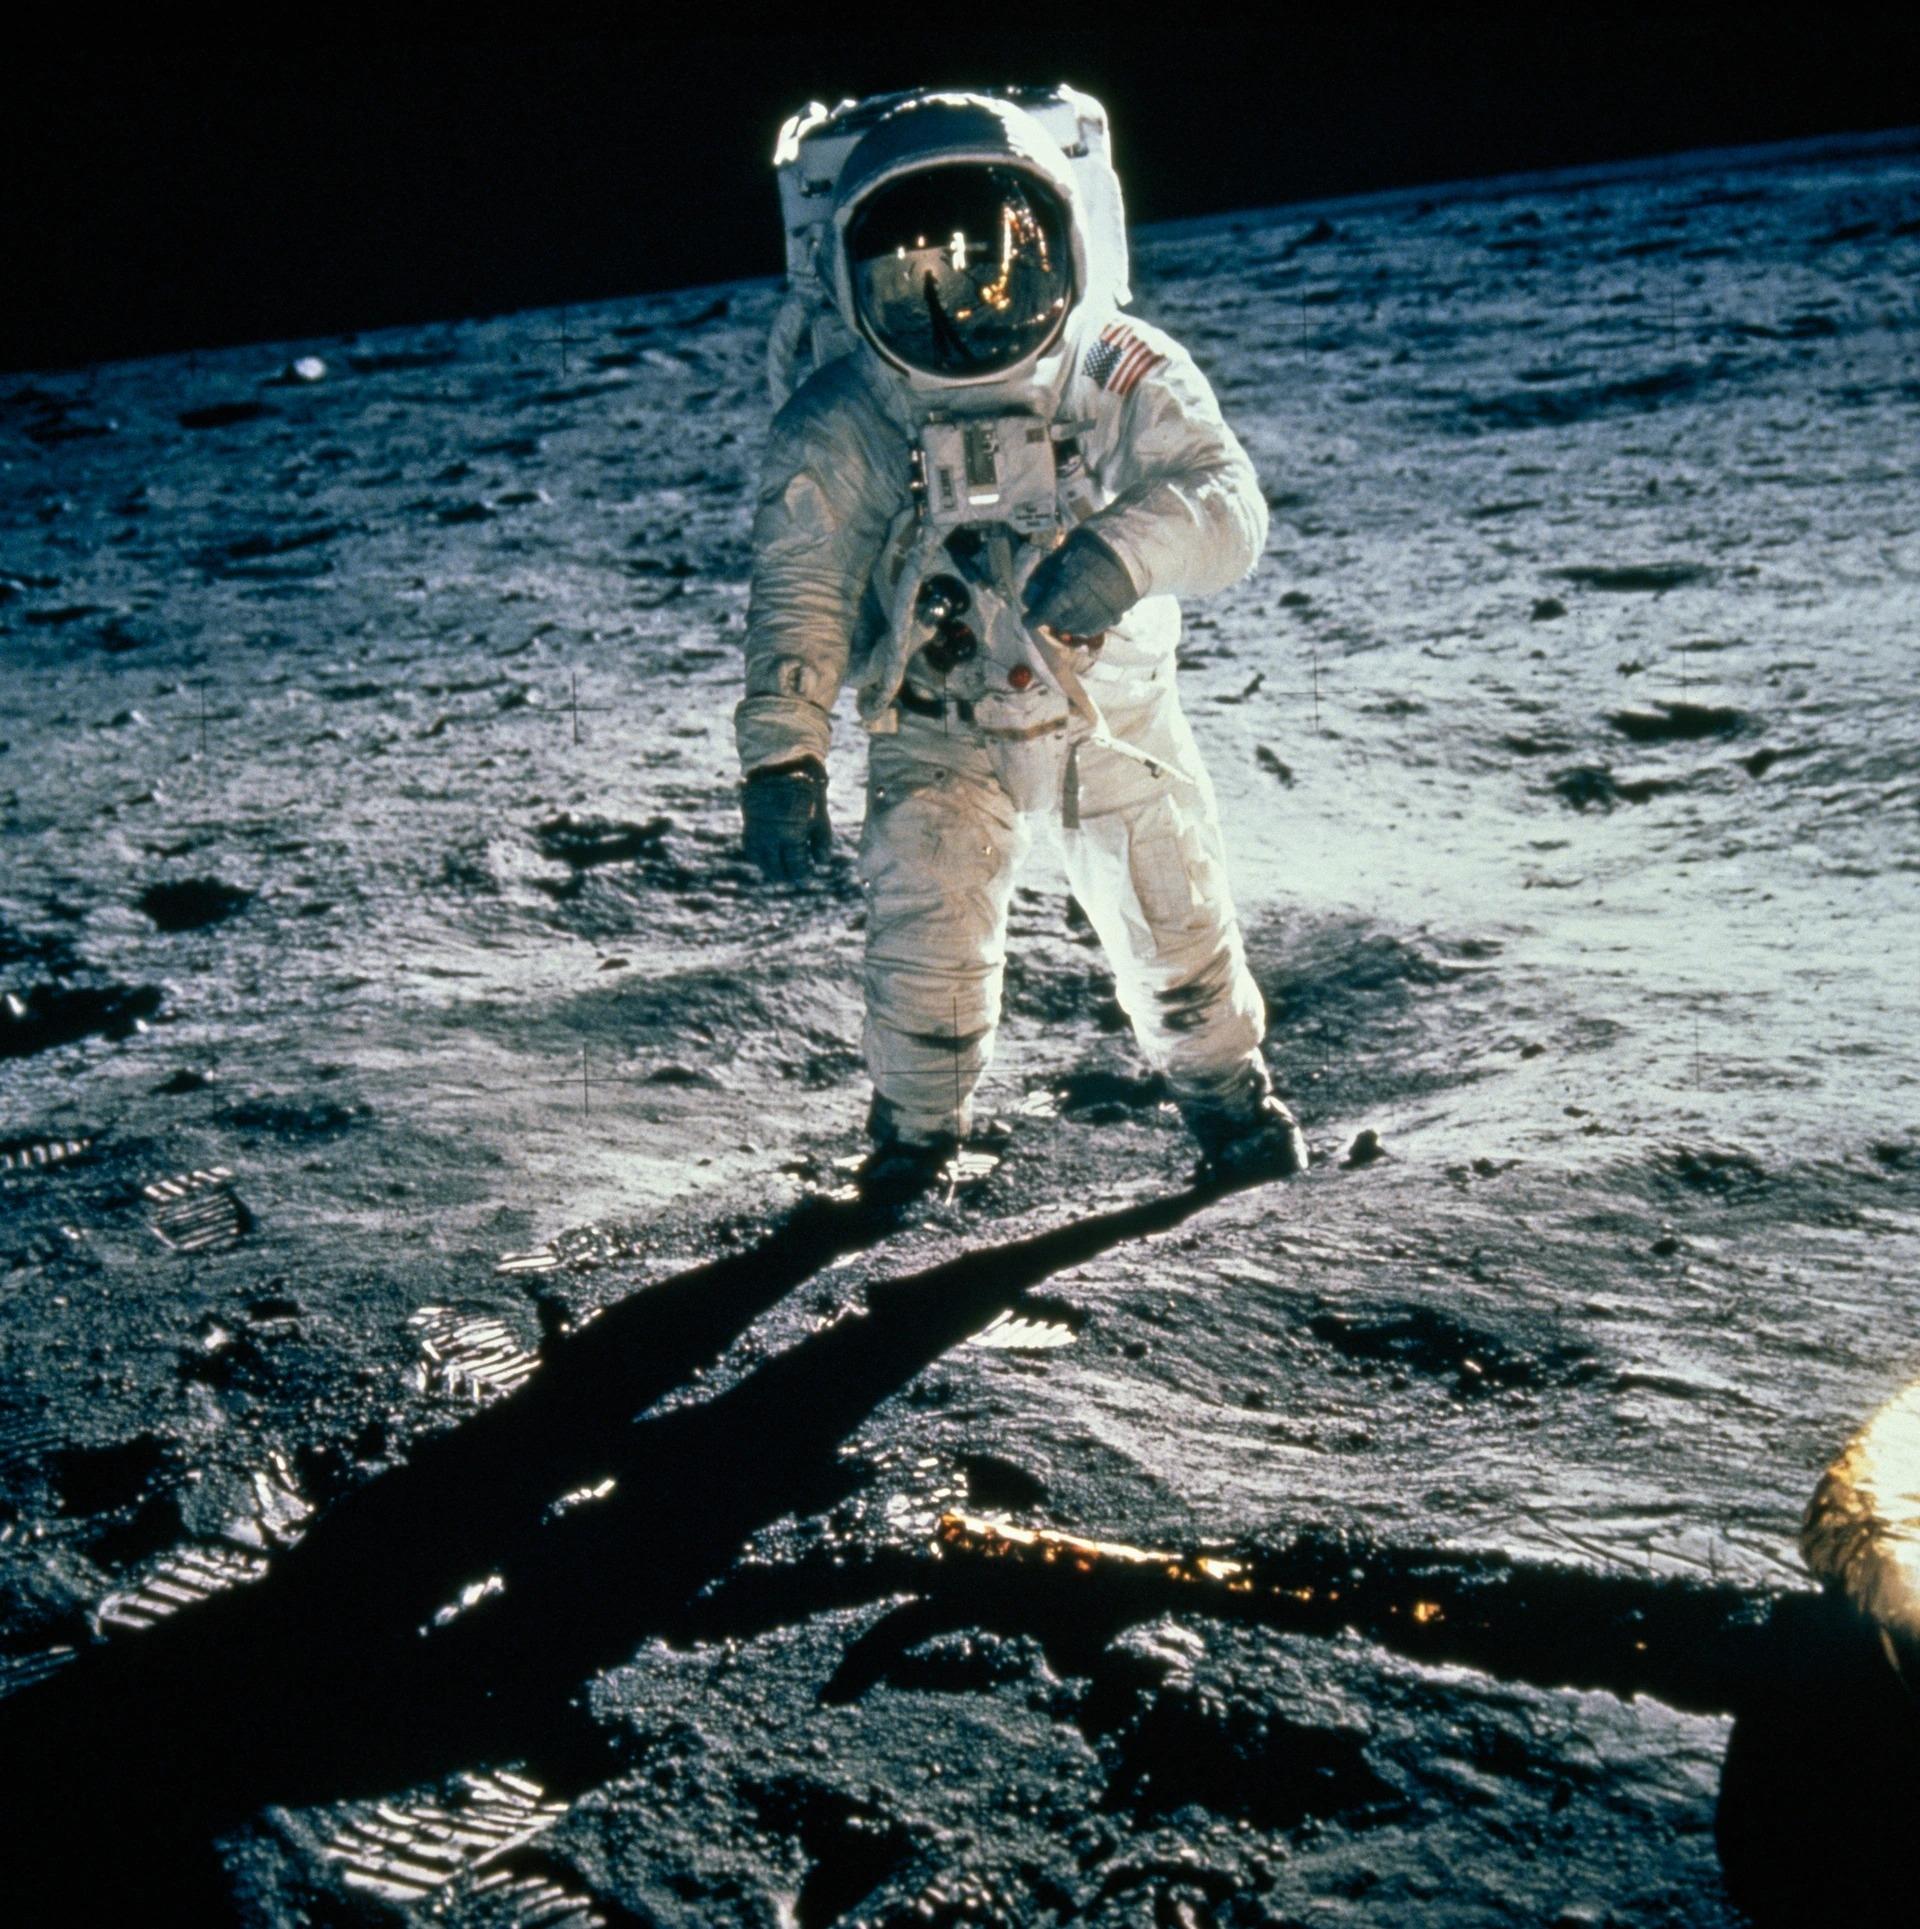 Photograph by NASA, Nat Geo Image Collection